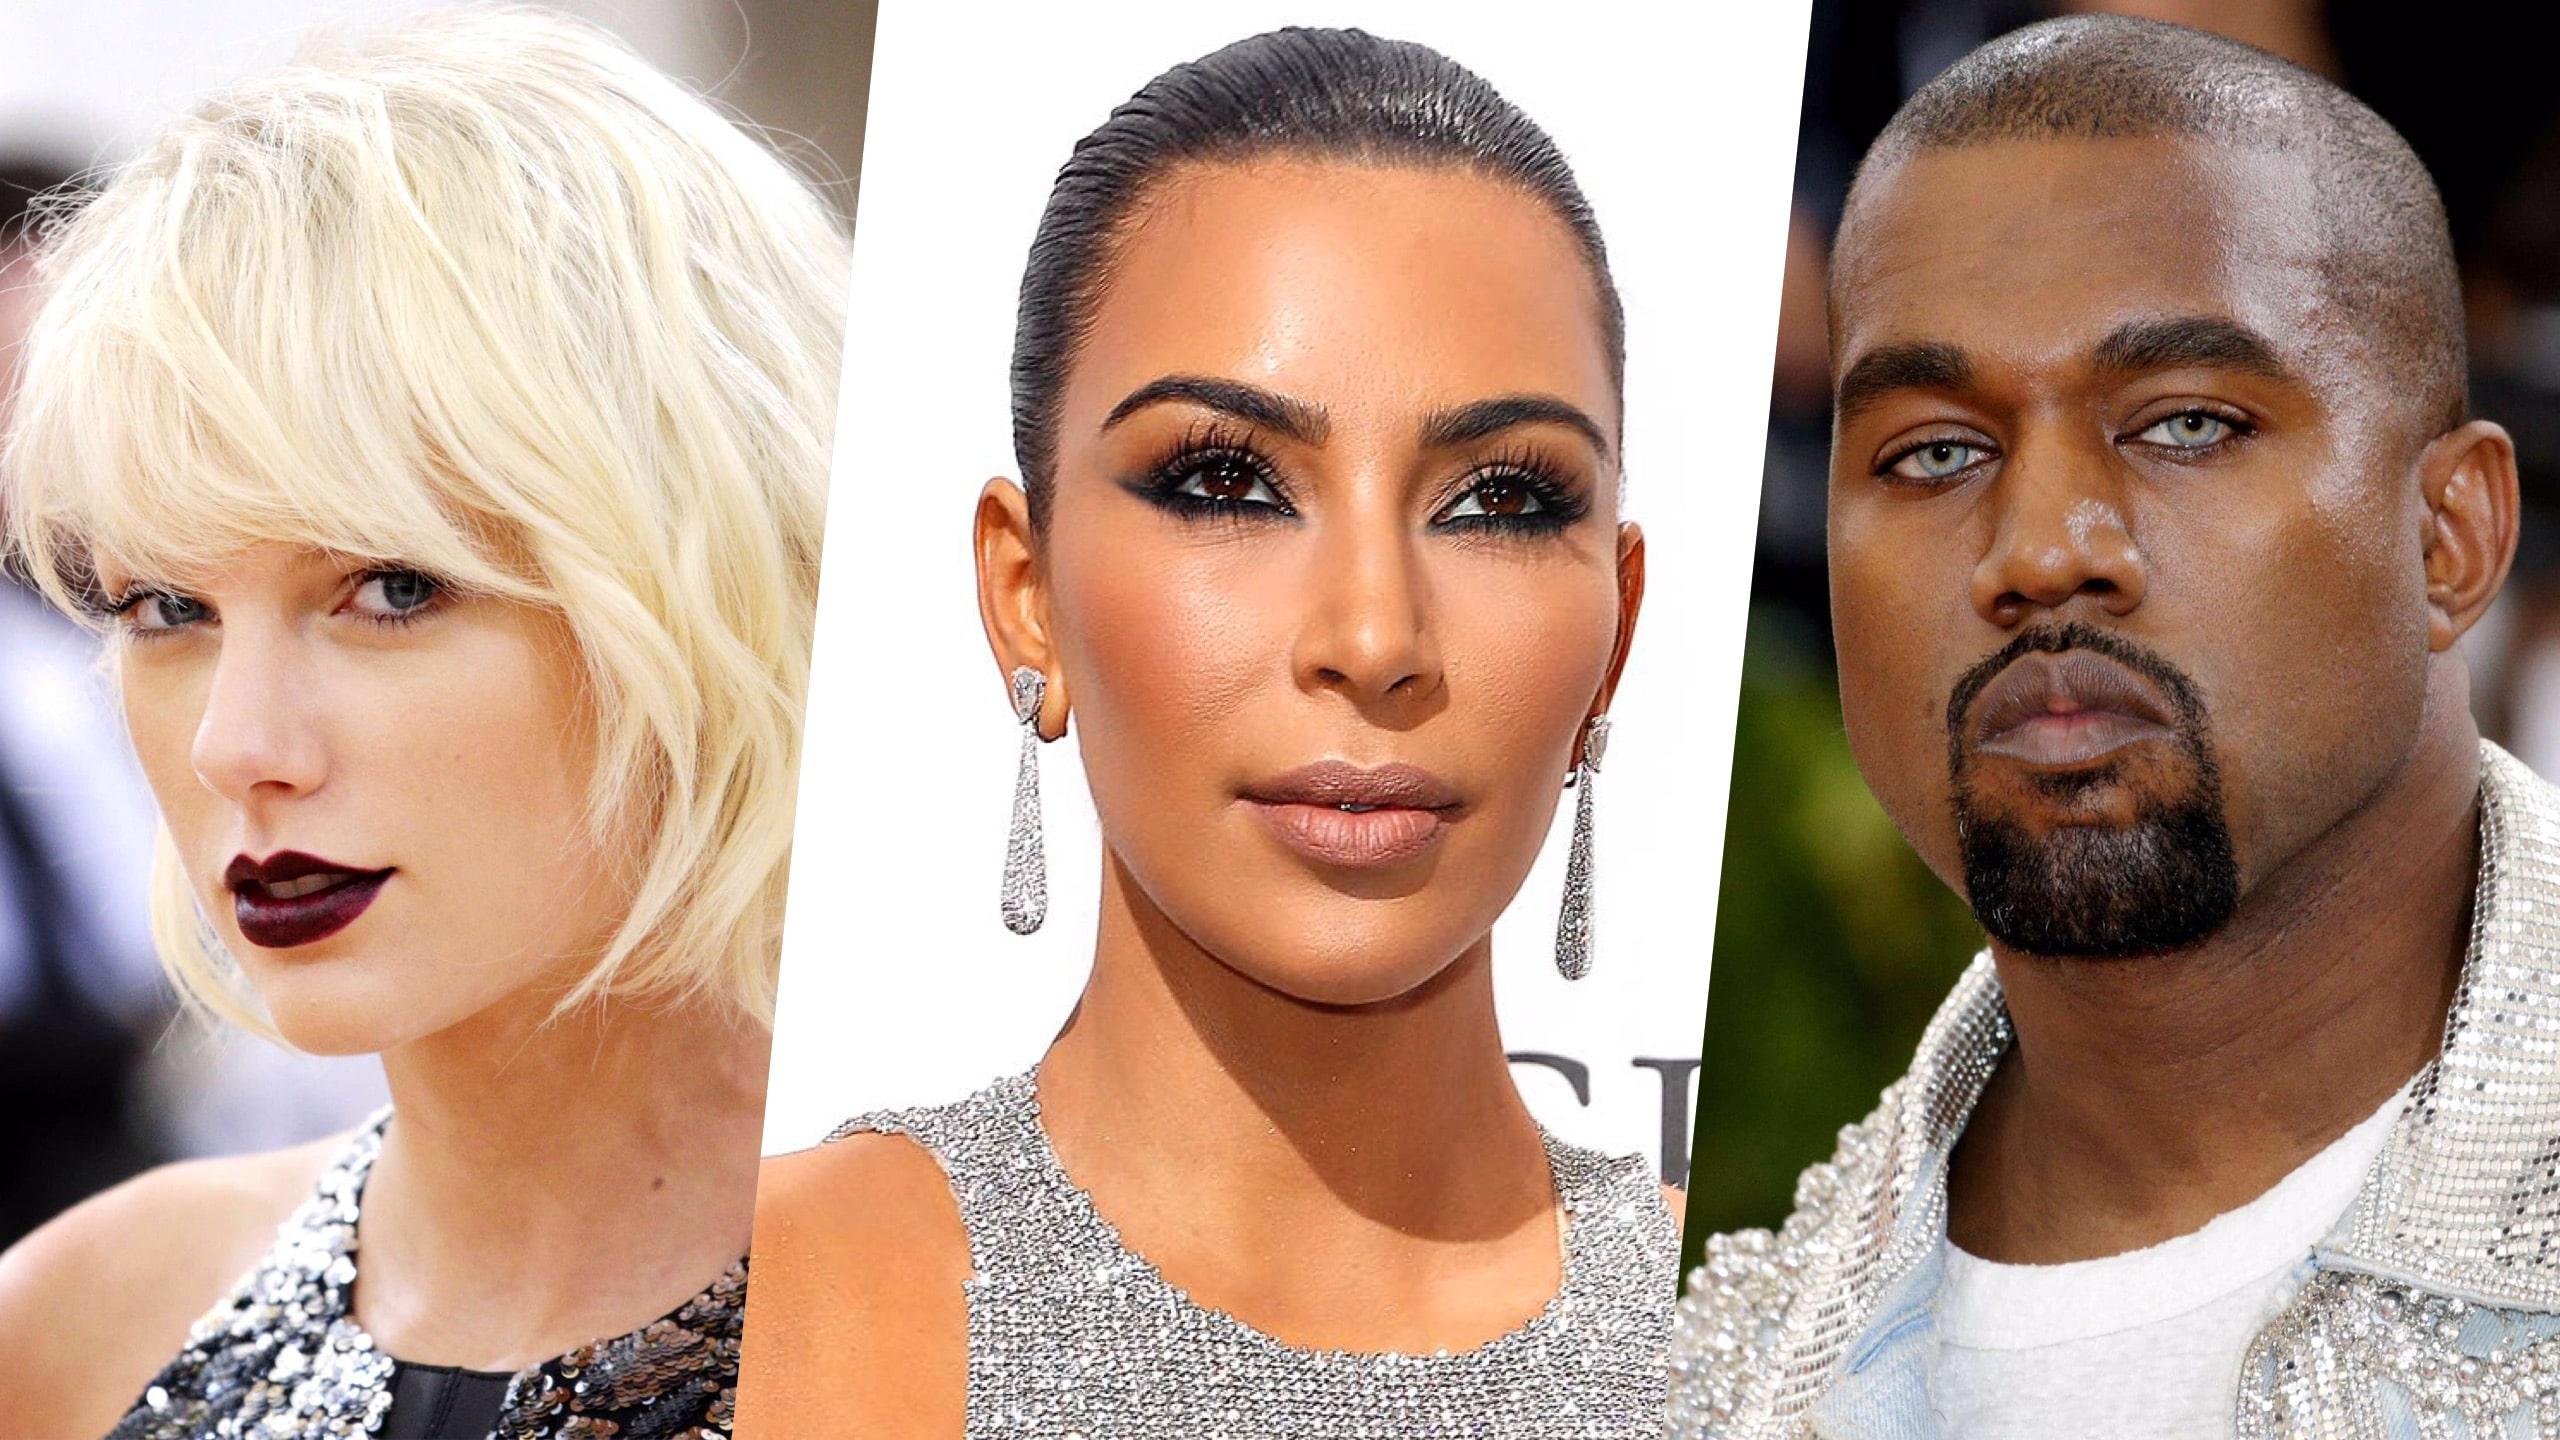 Taylor_Swift-Kim_Kardashian-Kanye_West_2